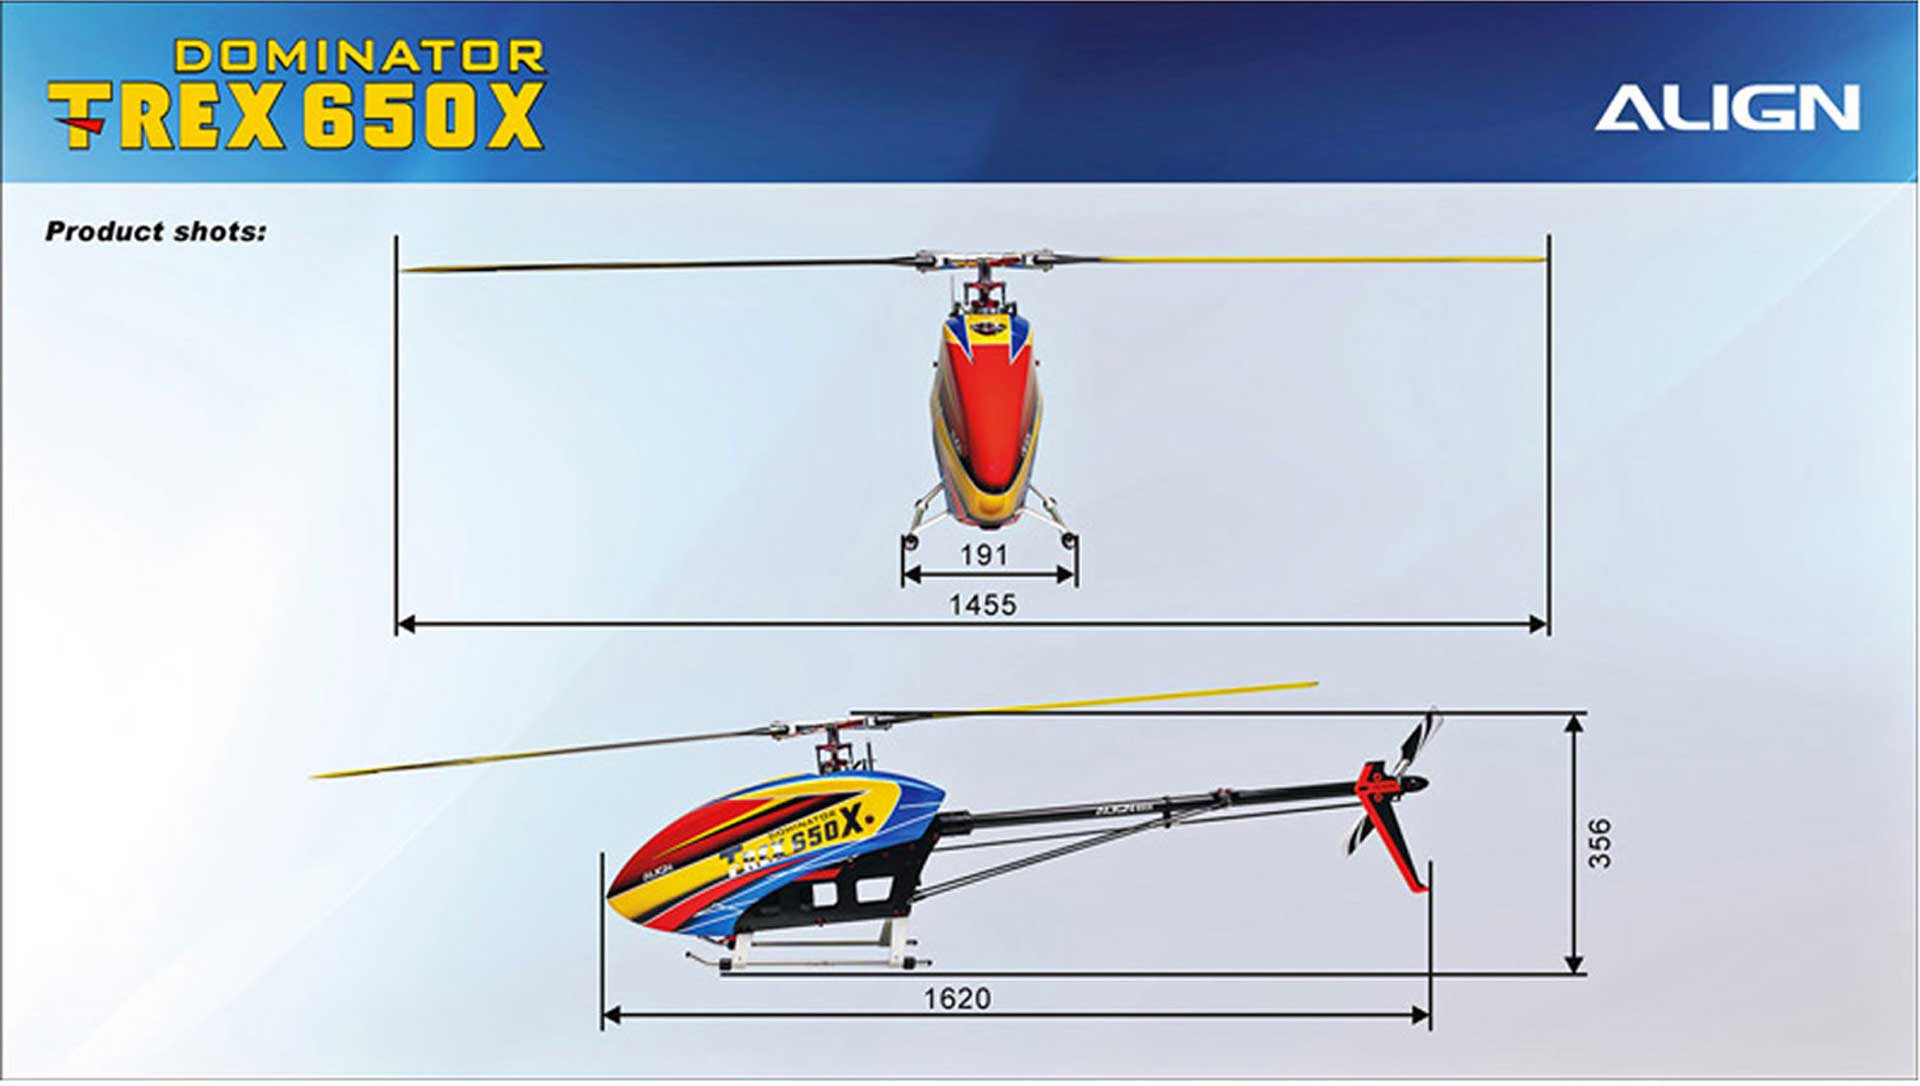 ALIGN T-REX 650X Dominator Super Combo (12S)